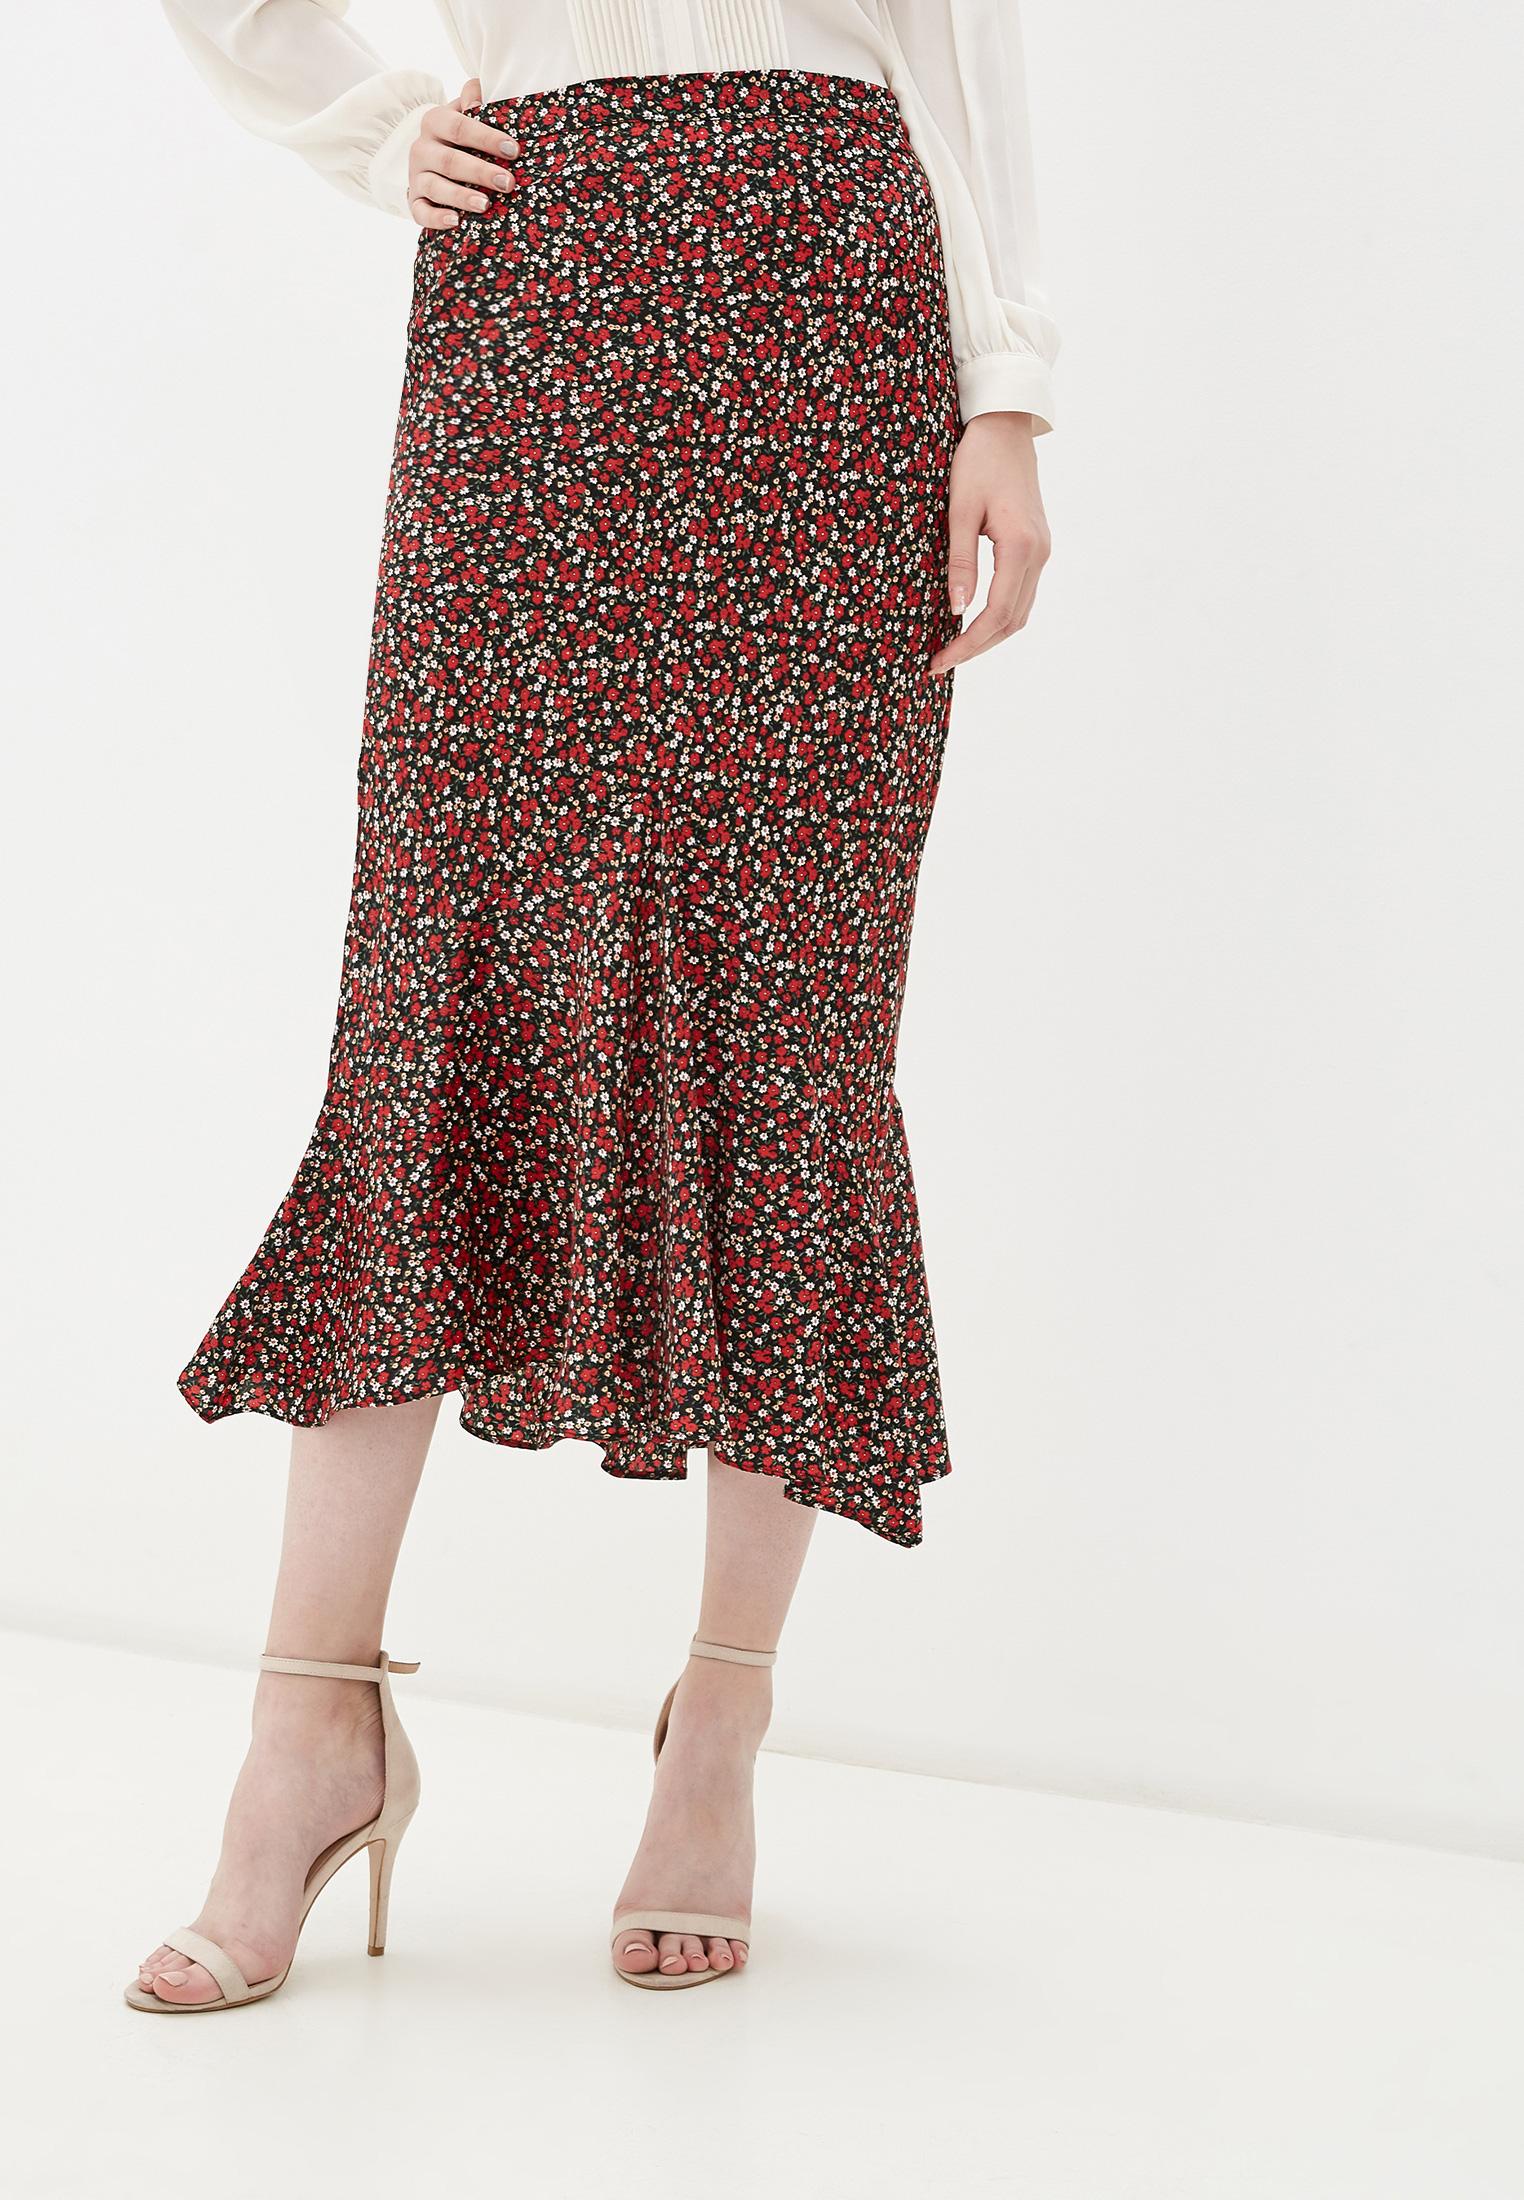 Узкая юбка Topshop (Топ Шоп) 27N52RRED